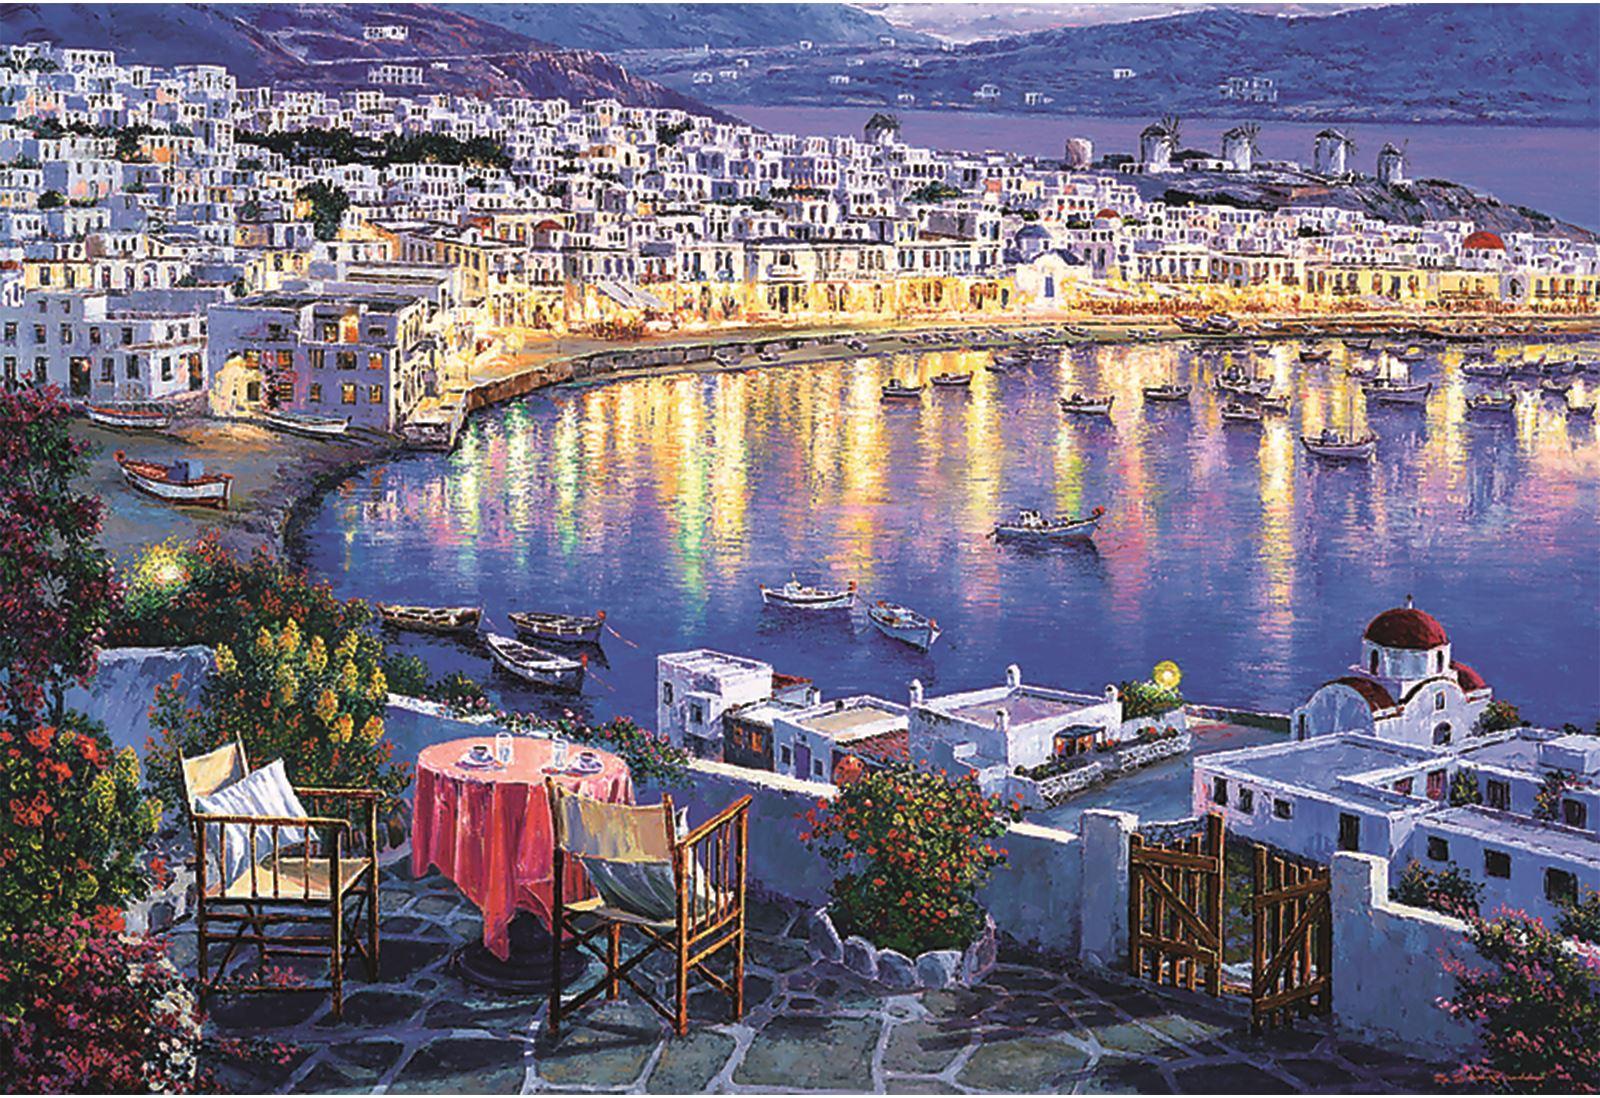 Trefl-300-500-1000-1500-2000-3000-4000-6000-Piece-Jigsaw-Puzzle-Landscapes-City thumbnail 236